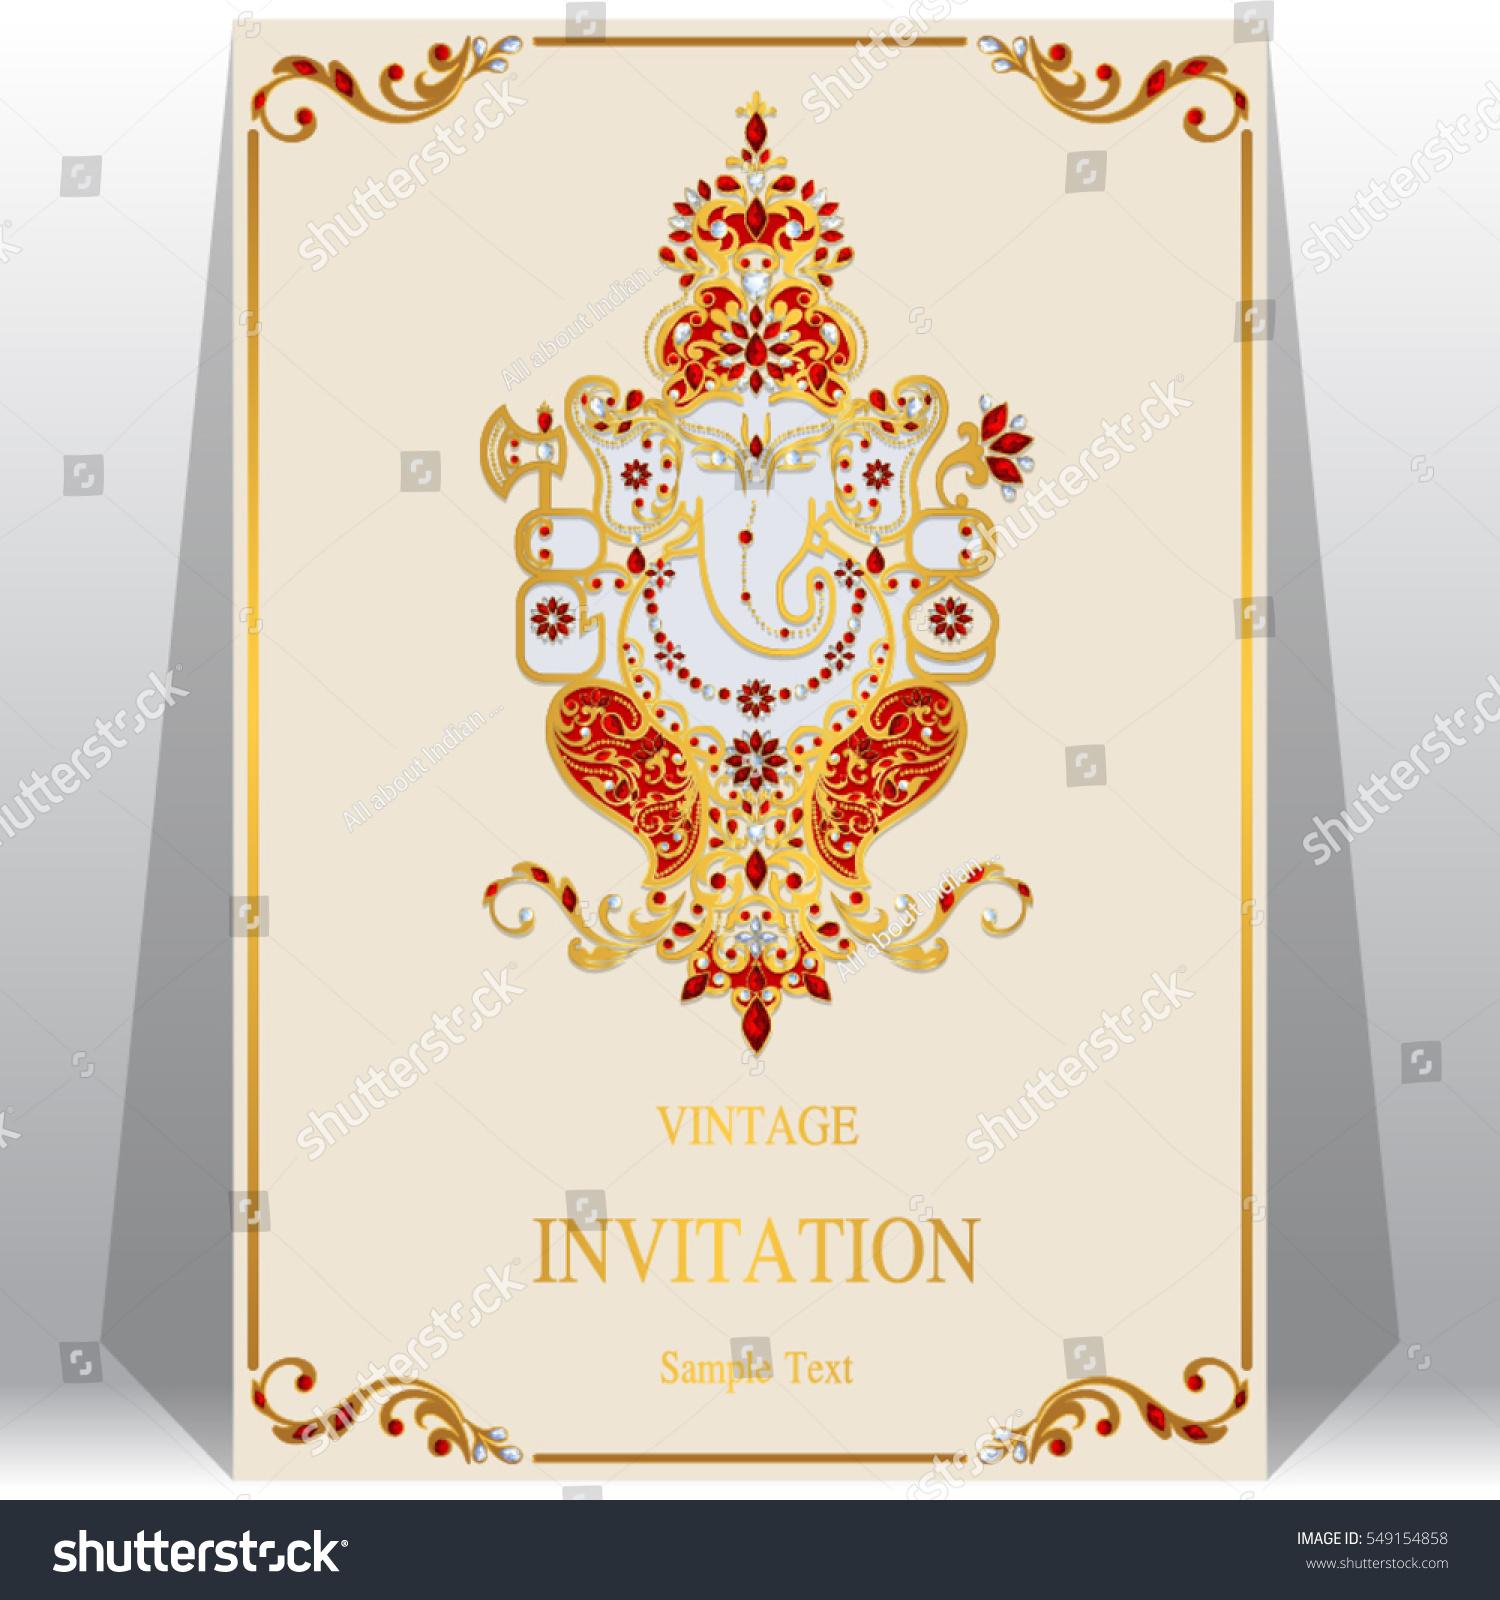 Indian Wedding Invitation Card Templates Gold Stock Vector (2018 ...